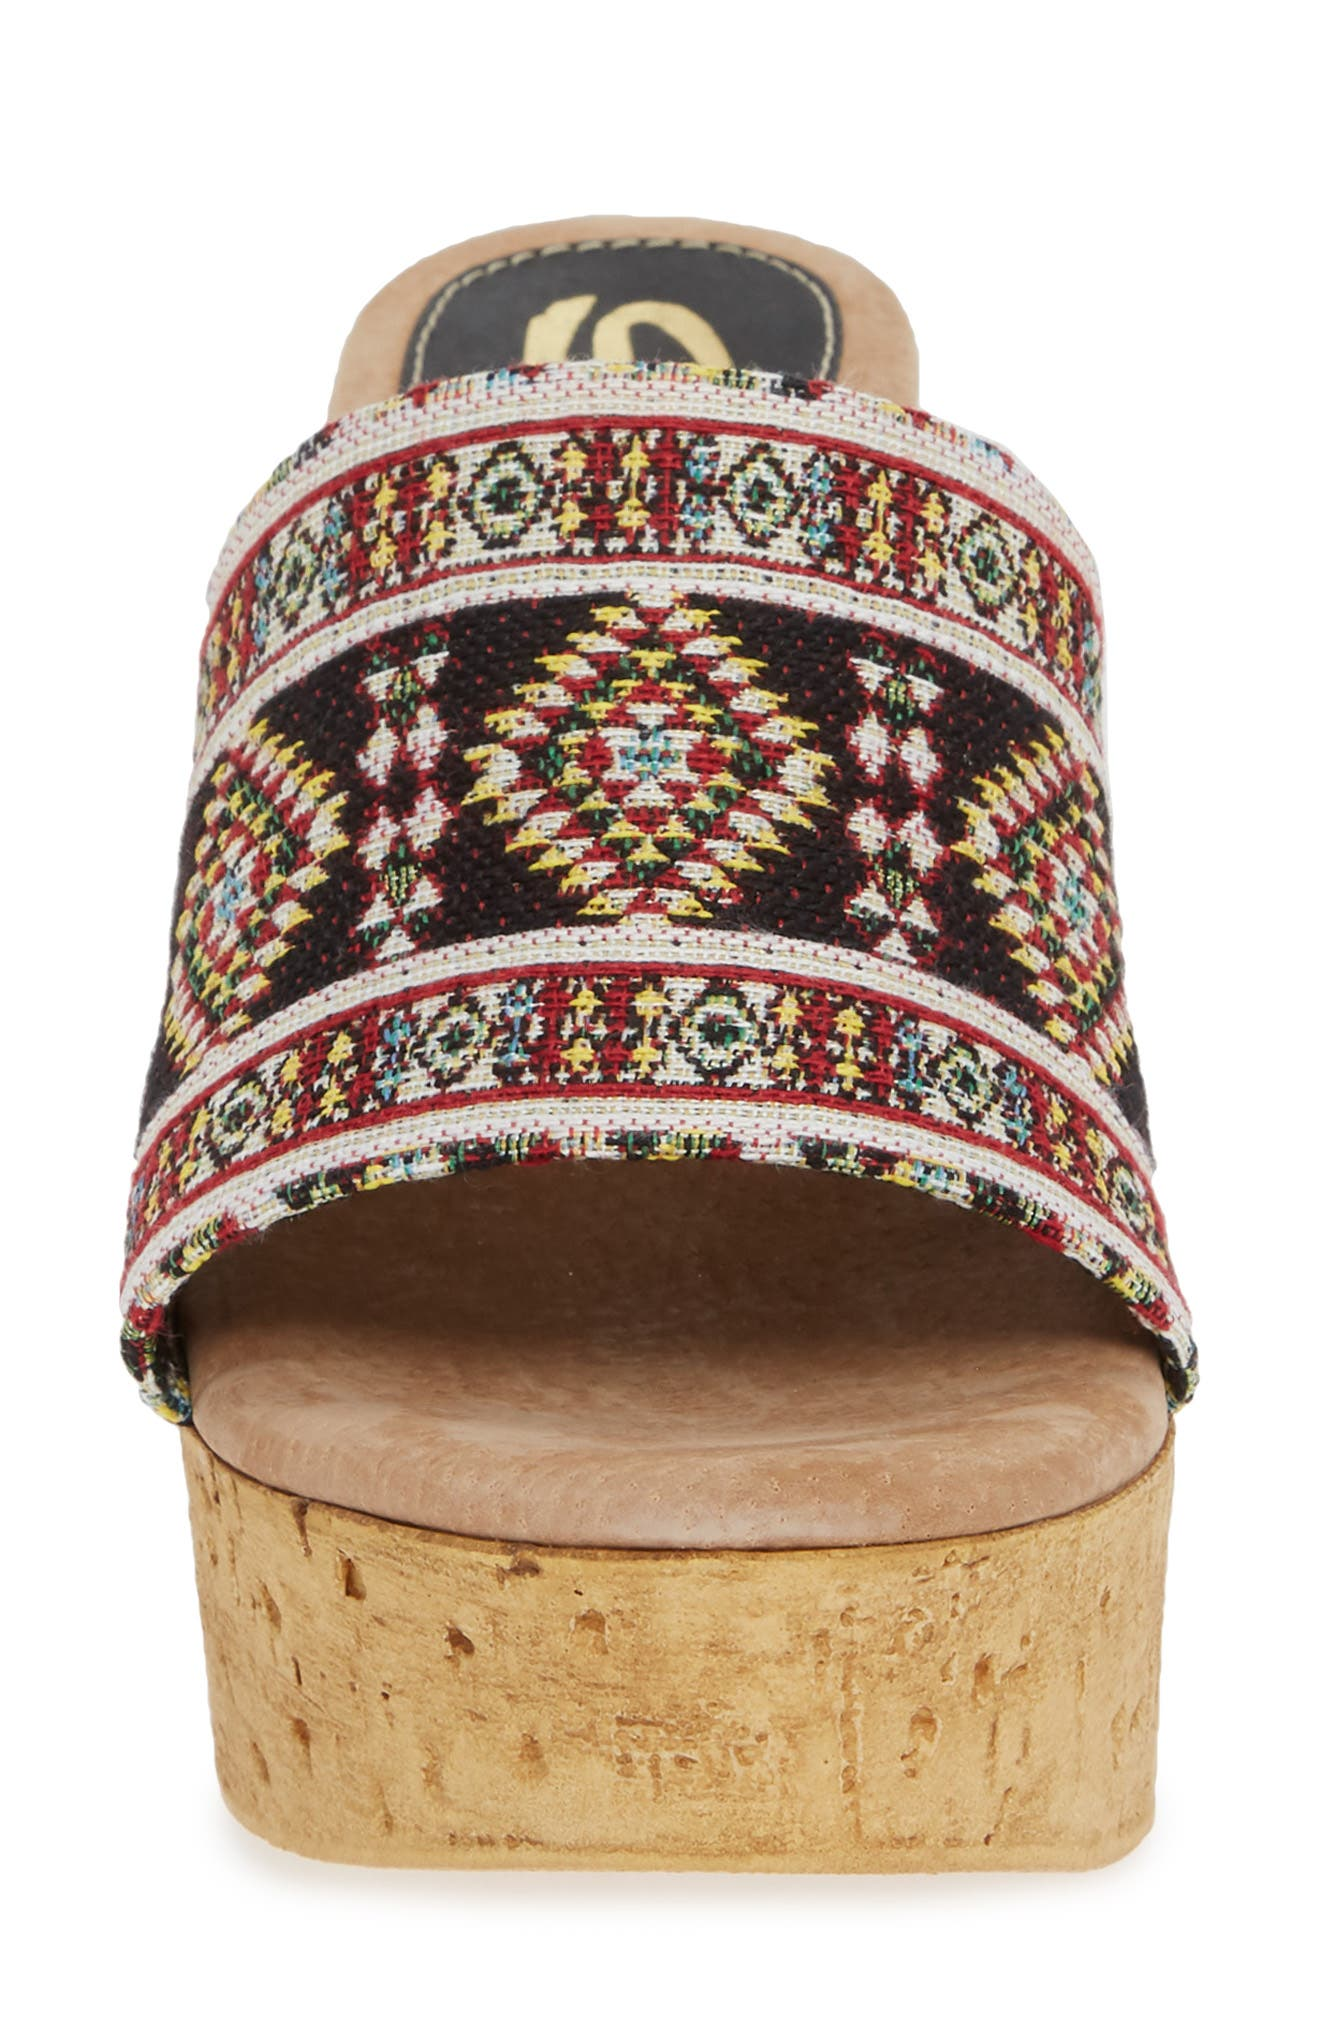 Orabela Platform Wedge Sandal,                             Alternate thumbnail 4, color,                             BLACK MULTICOLOR FABRIC